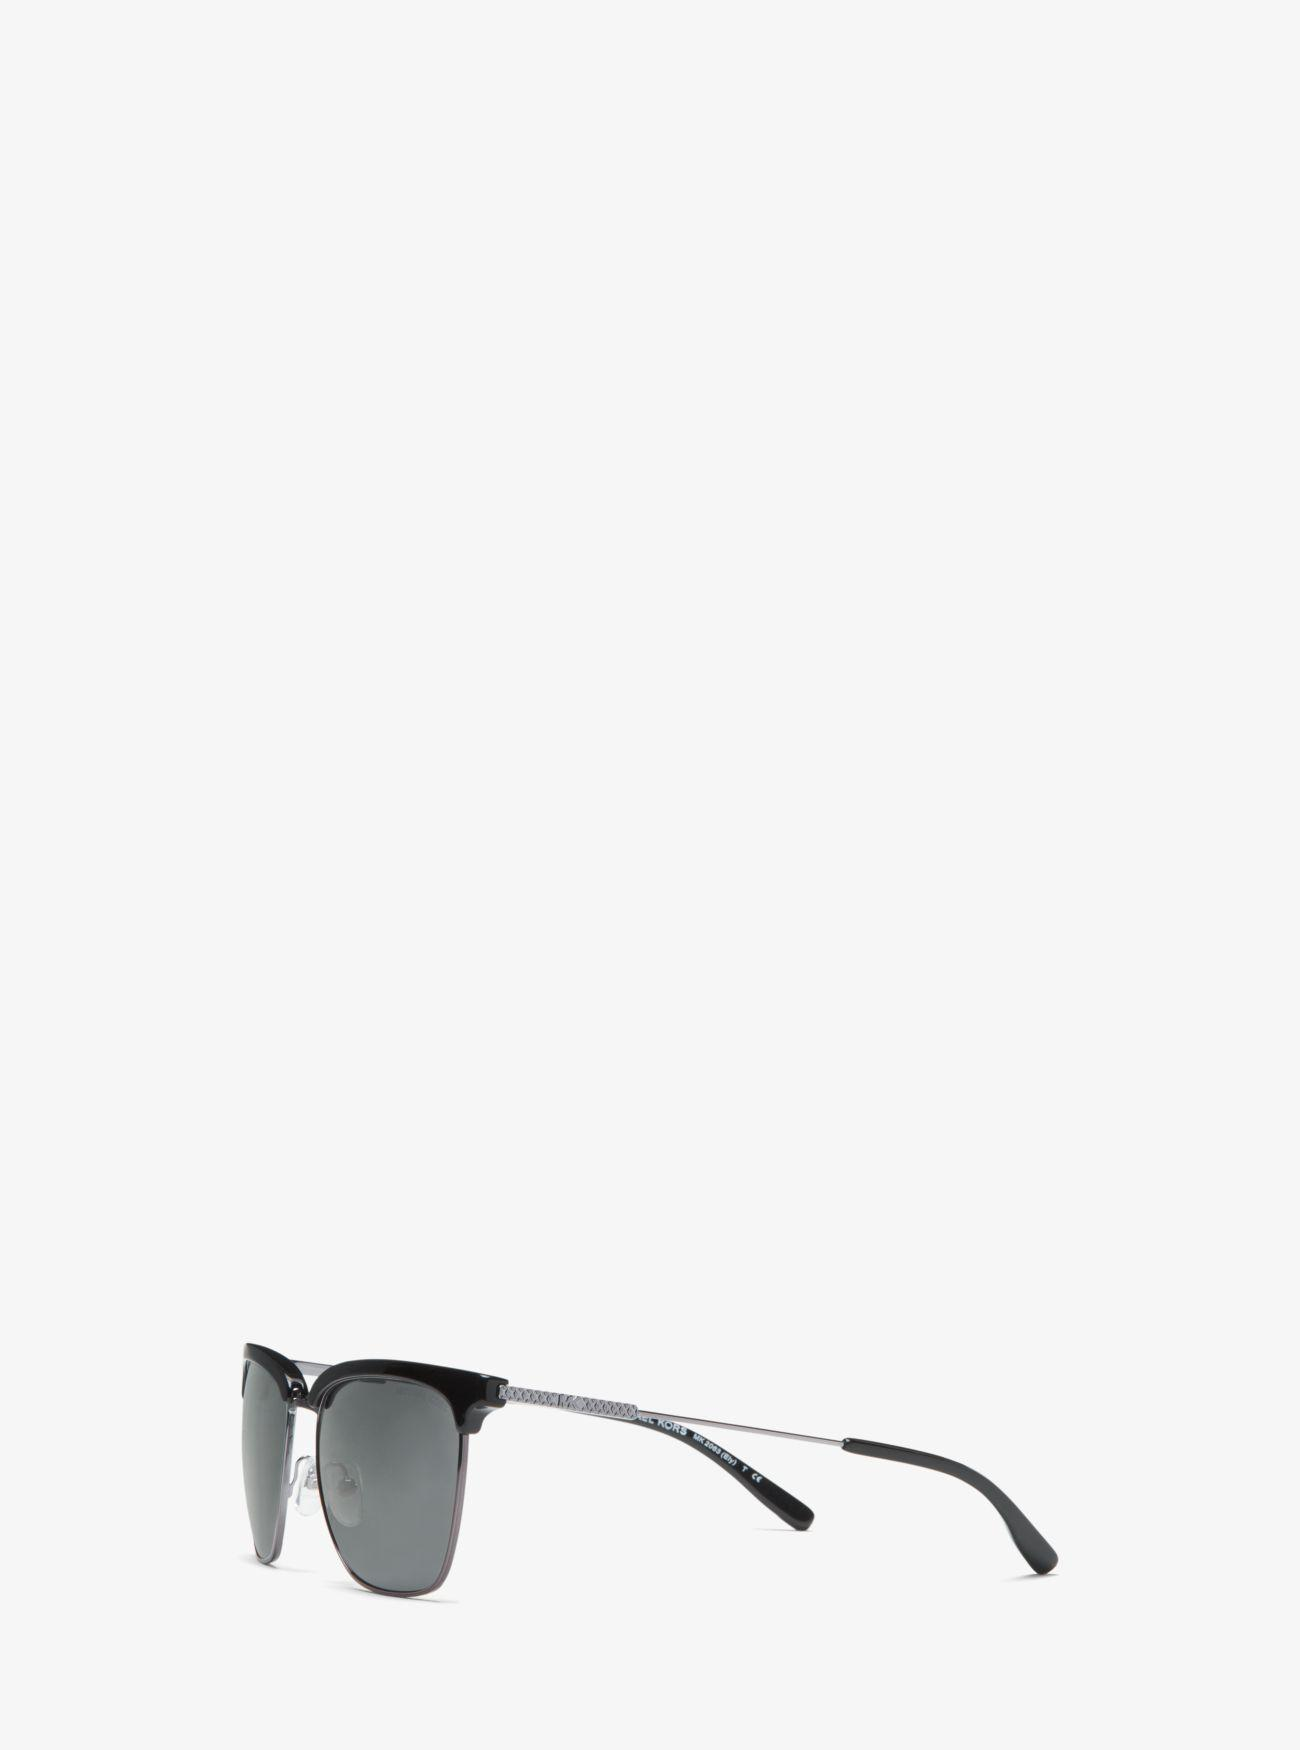 915bb0bbdbf2 Michael Kors Black Ely Sunglasses for men. View fullscreen